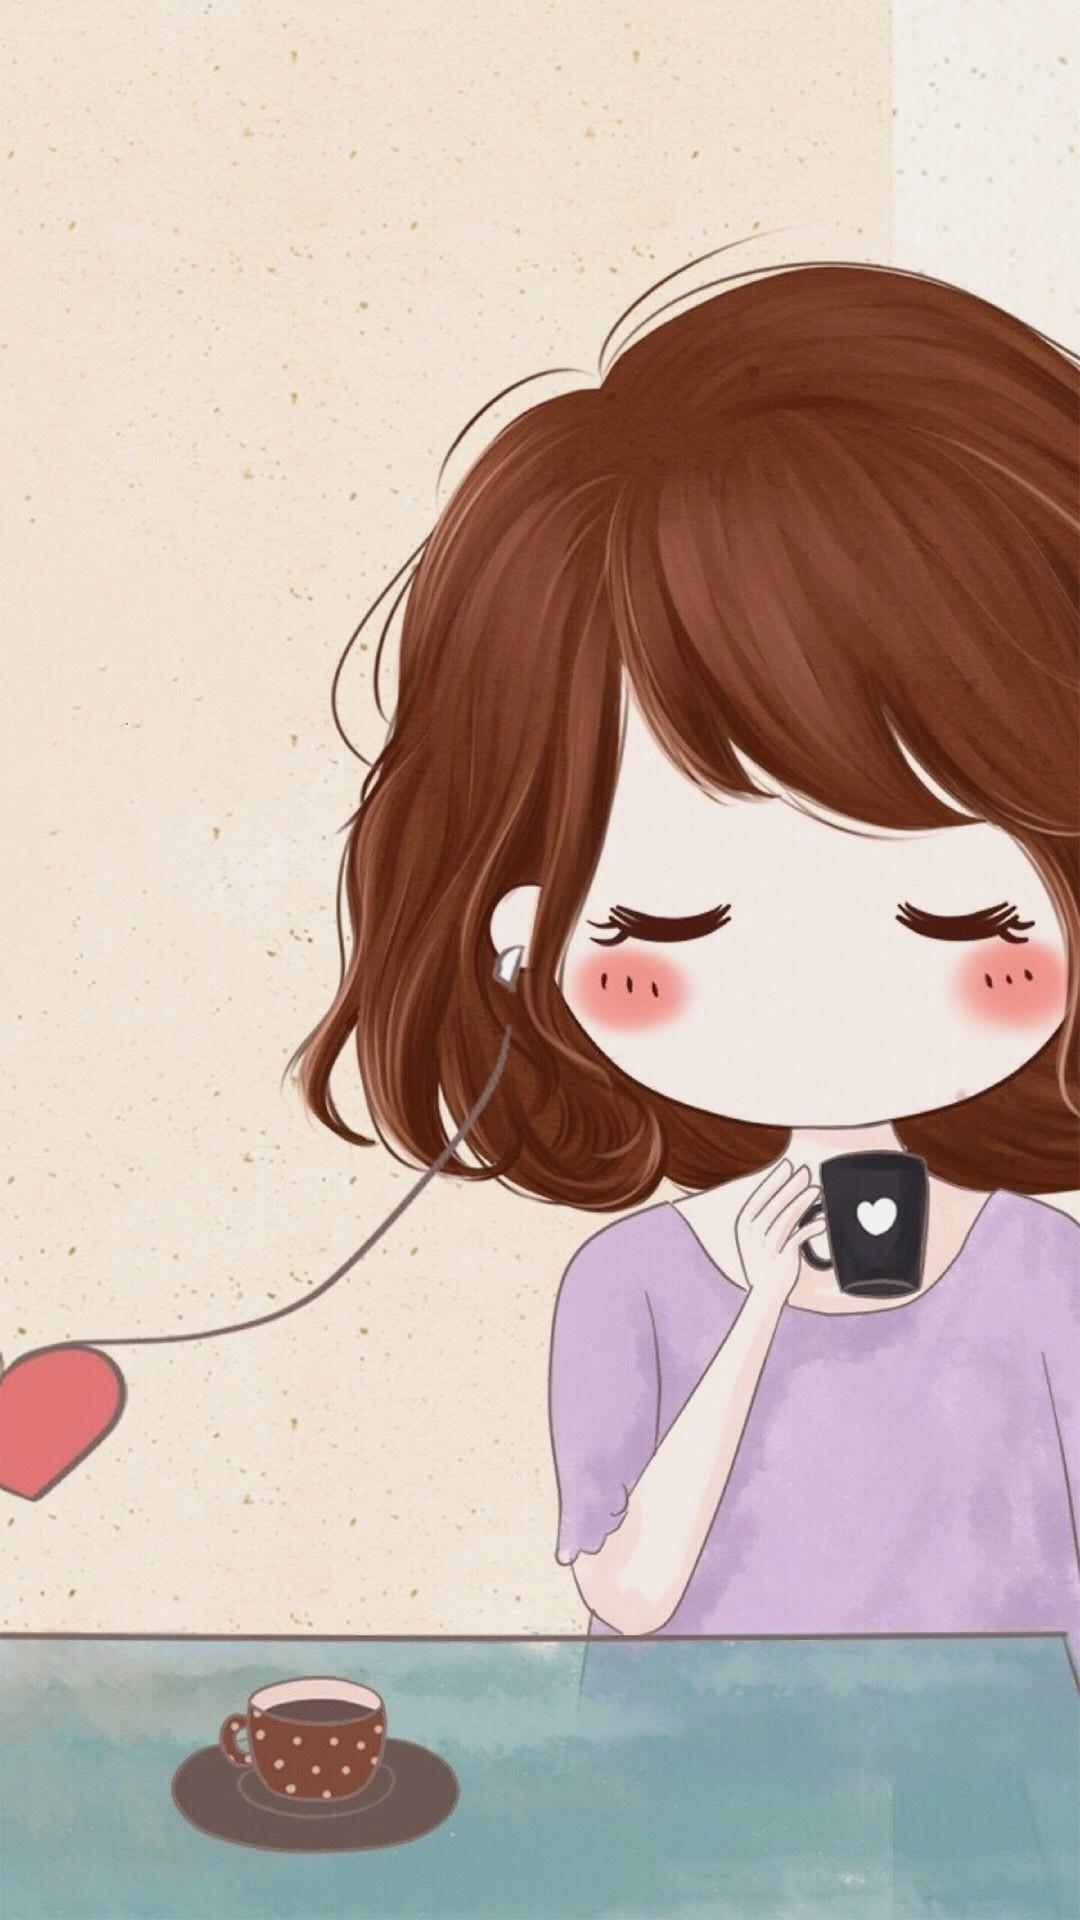 Res: 1080x1920, Lockscreen Couple Cute Wallpaper Backgrounds Kawaii Wallpaper Cute  Wallpapers Iphone Wallpaper